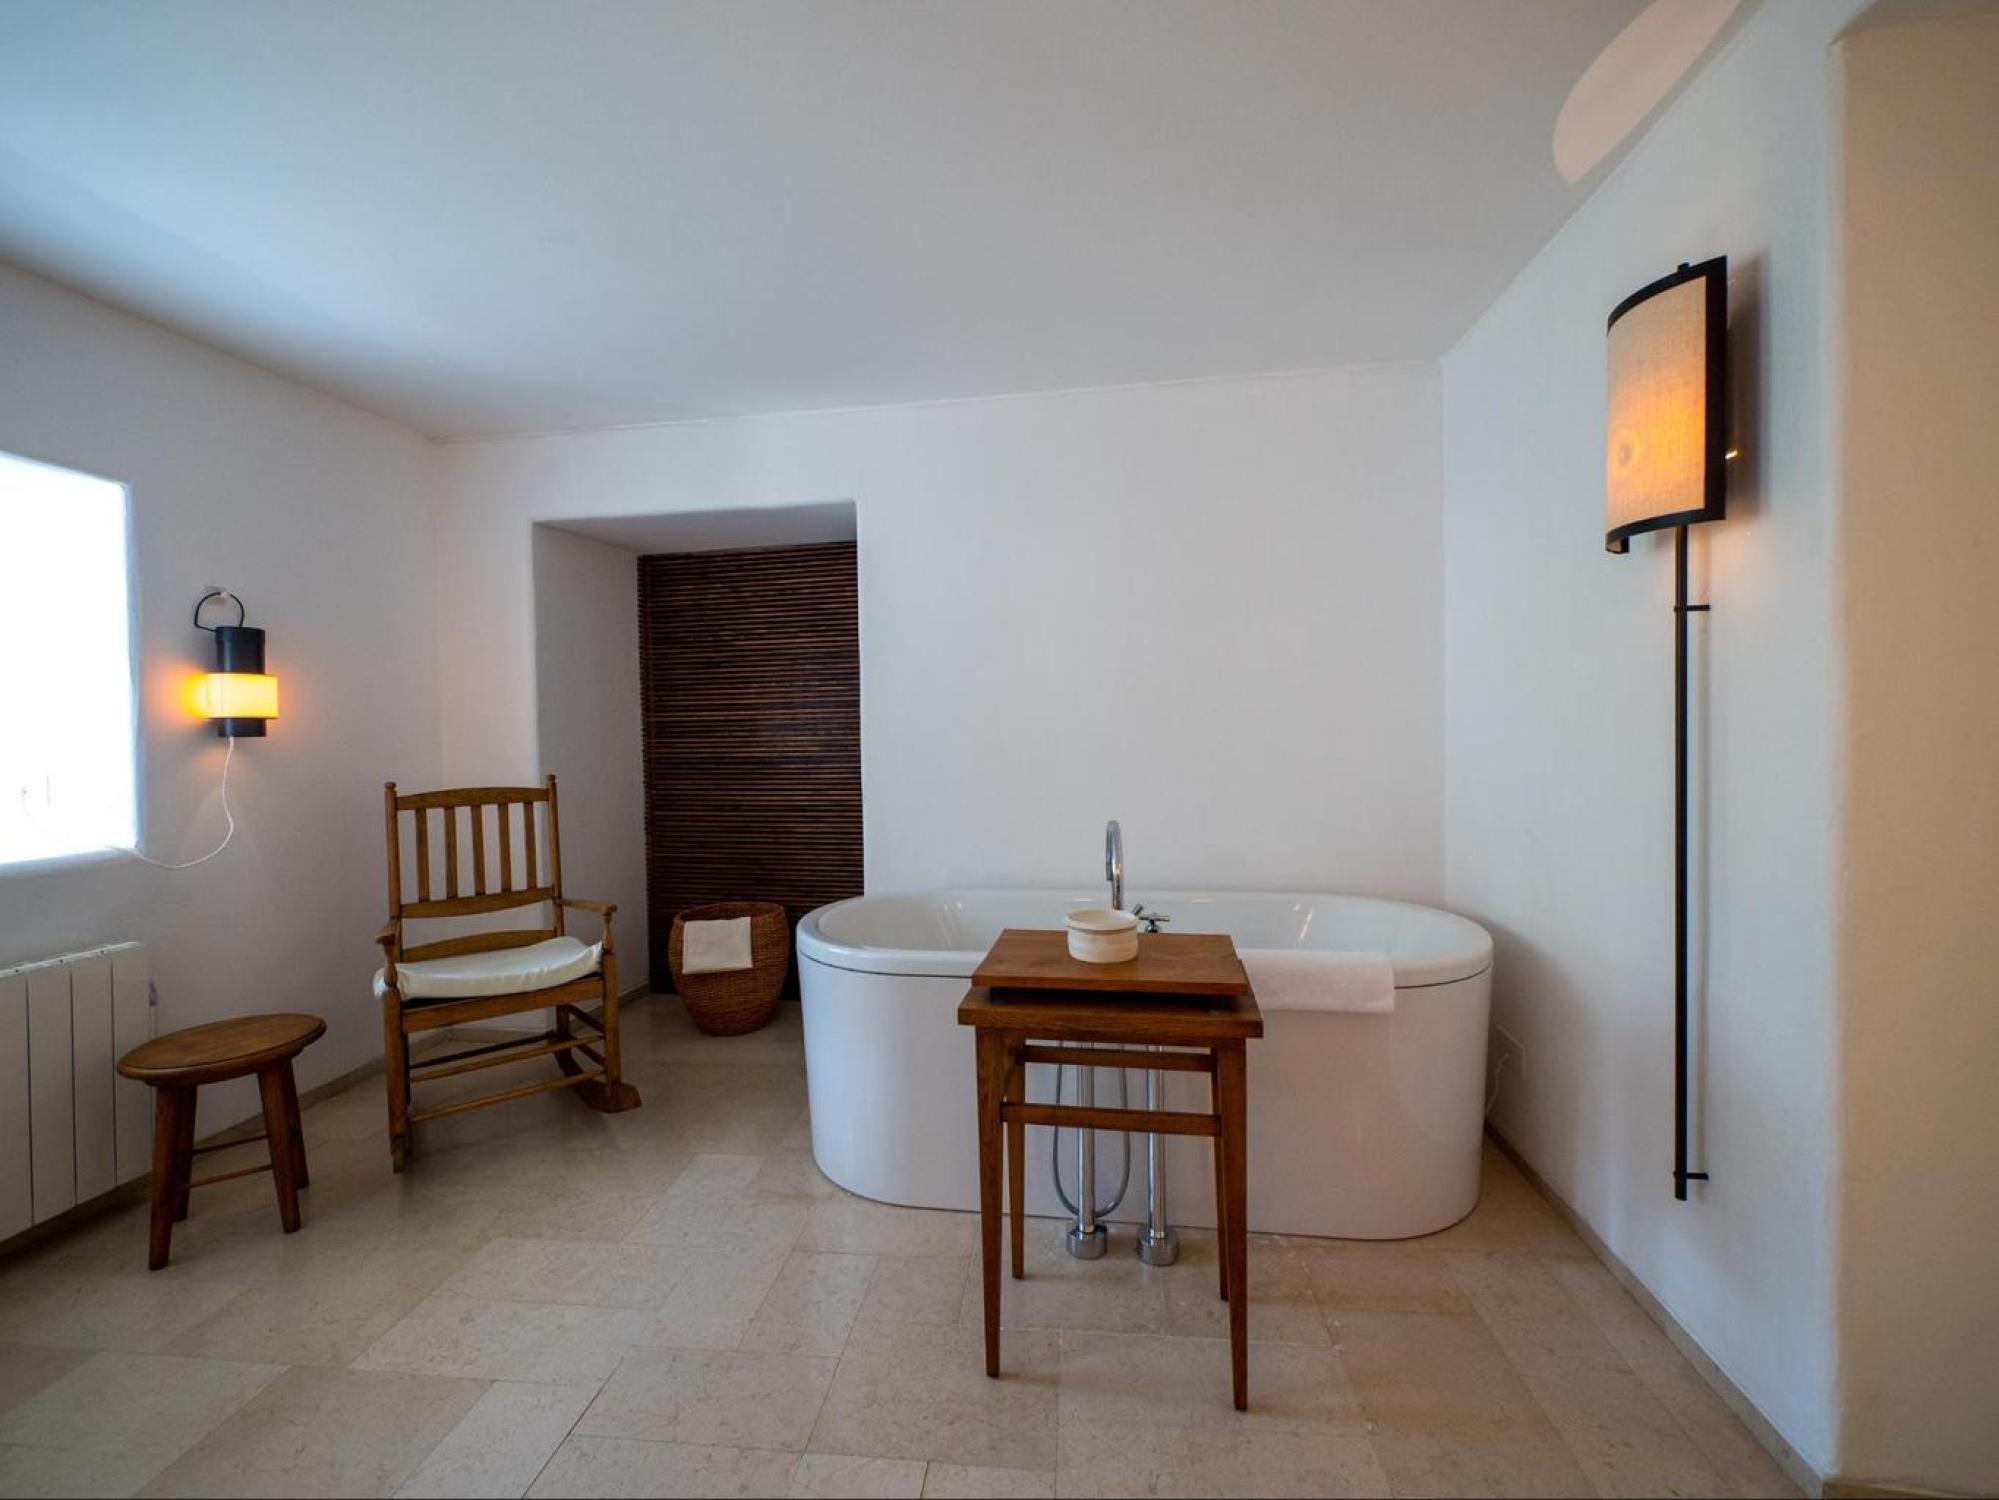 Free standing bathtub at Aman Sveti Stefan